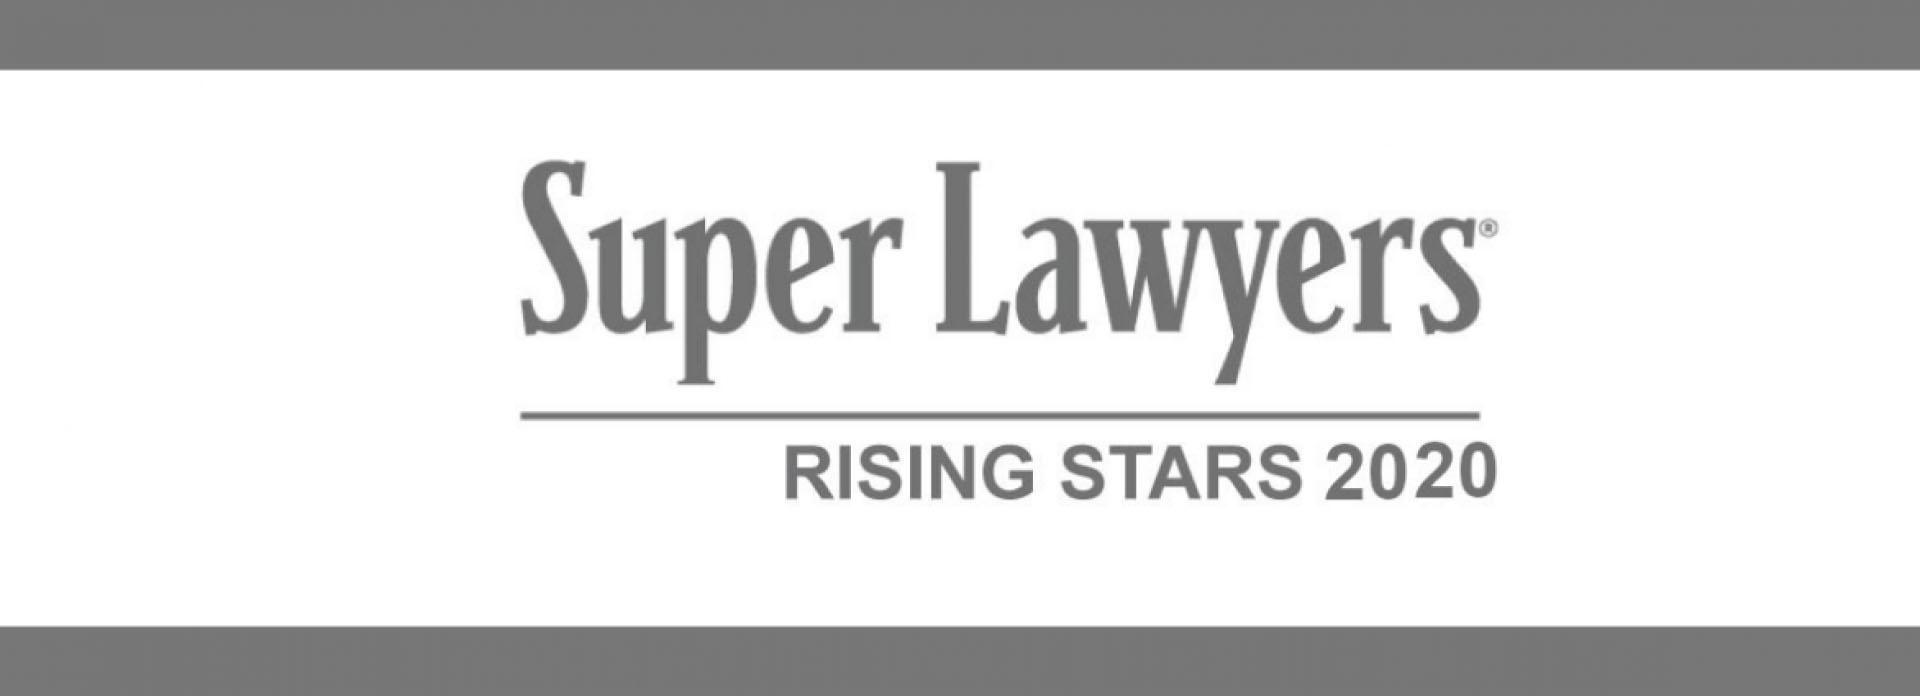 Super Lawyers Rising Stars 2020